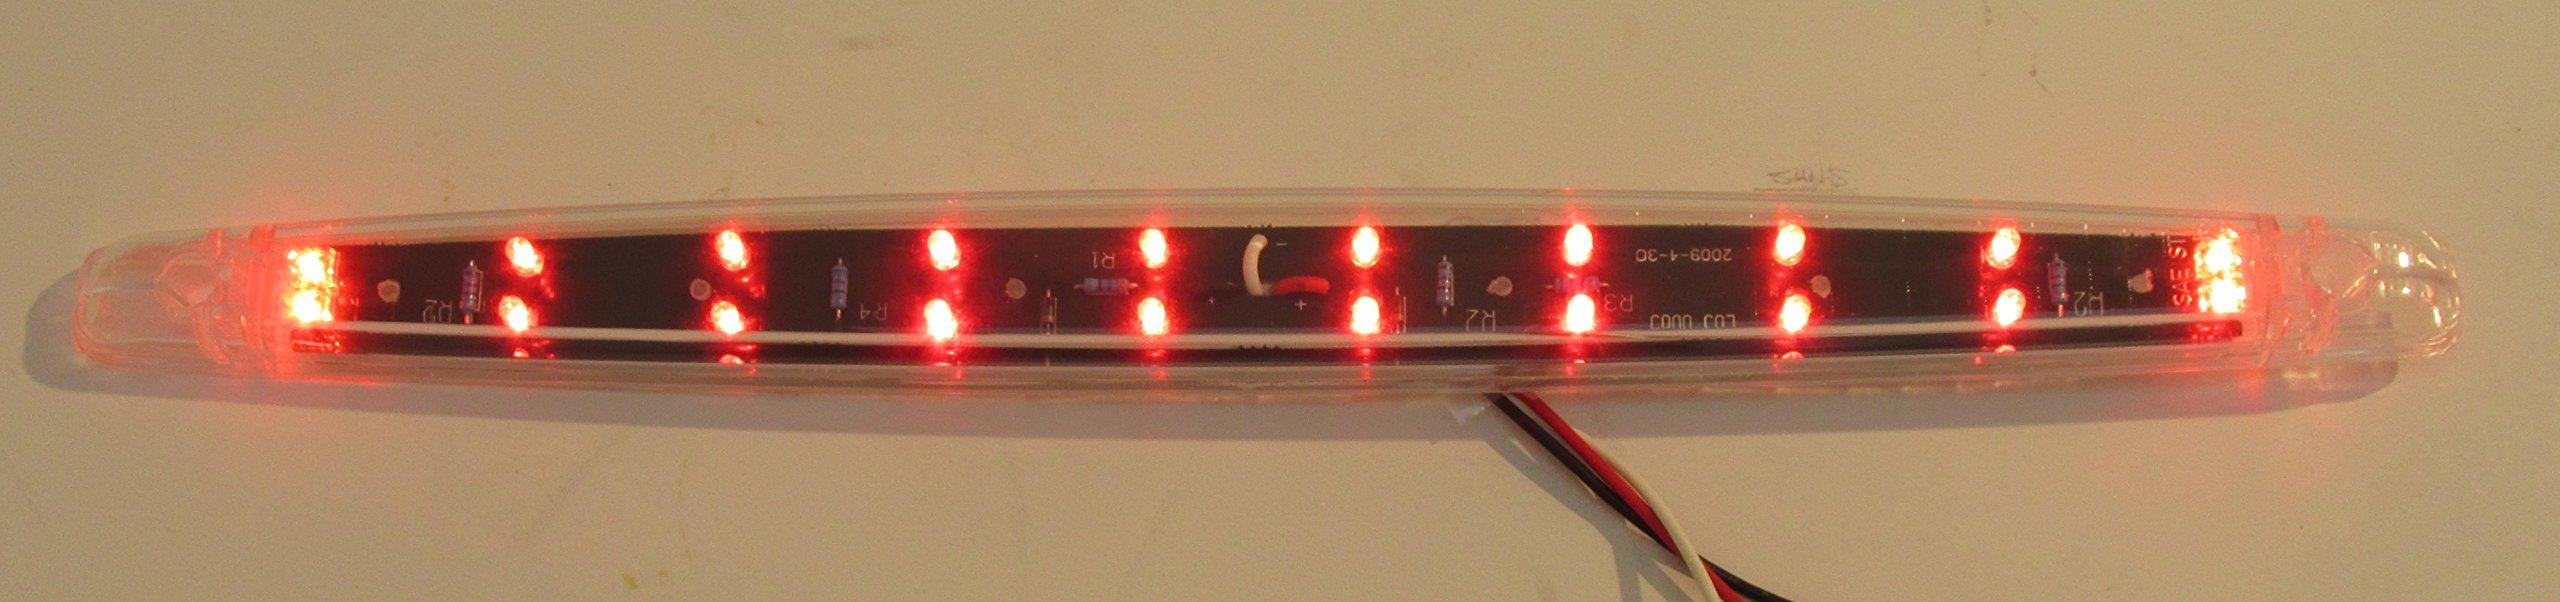 Kaper II L03-0065RI Red LED Stop/Turn/Tail Light